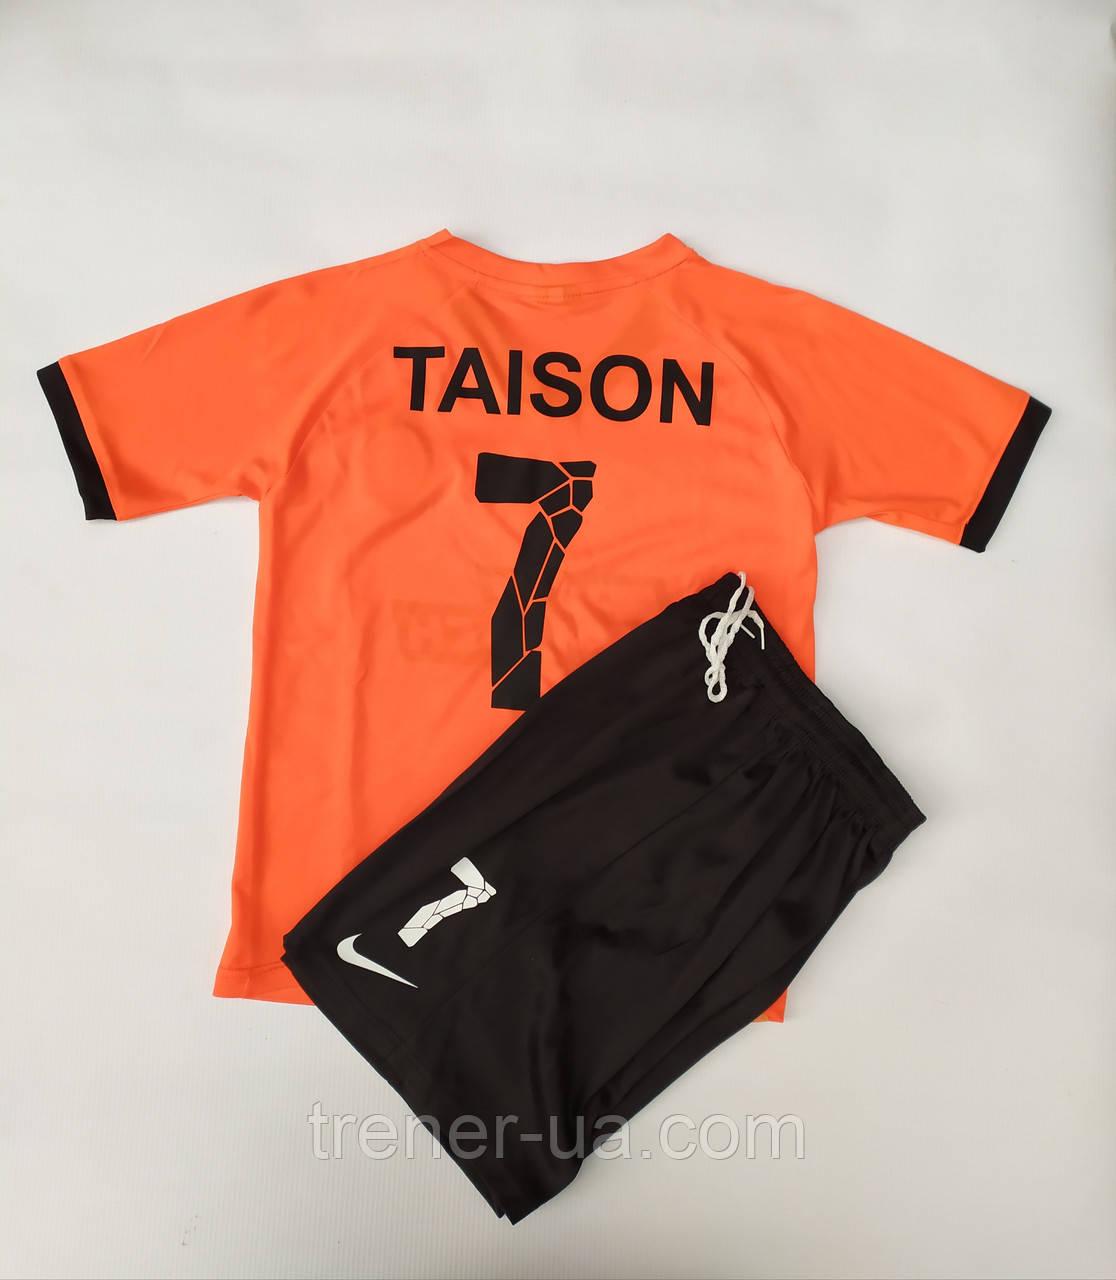 Футбольная форма детская/Шахтер Taison оранжевая 2020 года/комплект формы Шахтер/Шахтер Тайсон/Шахтер Донецк/